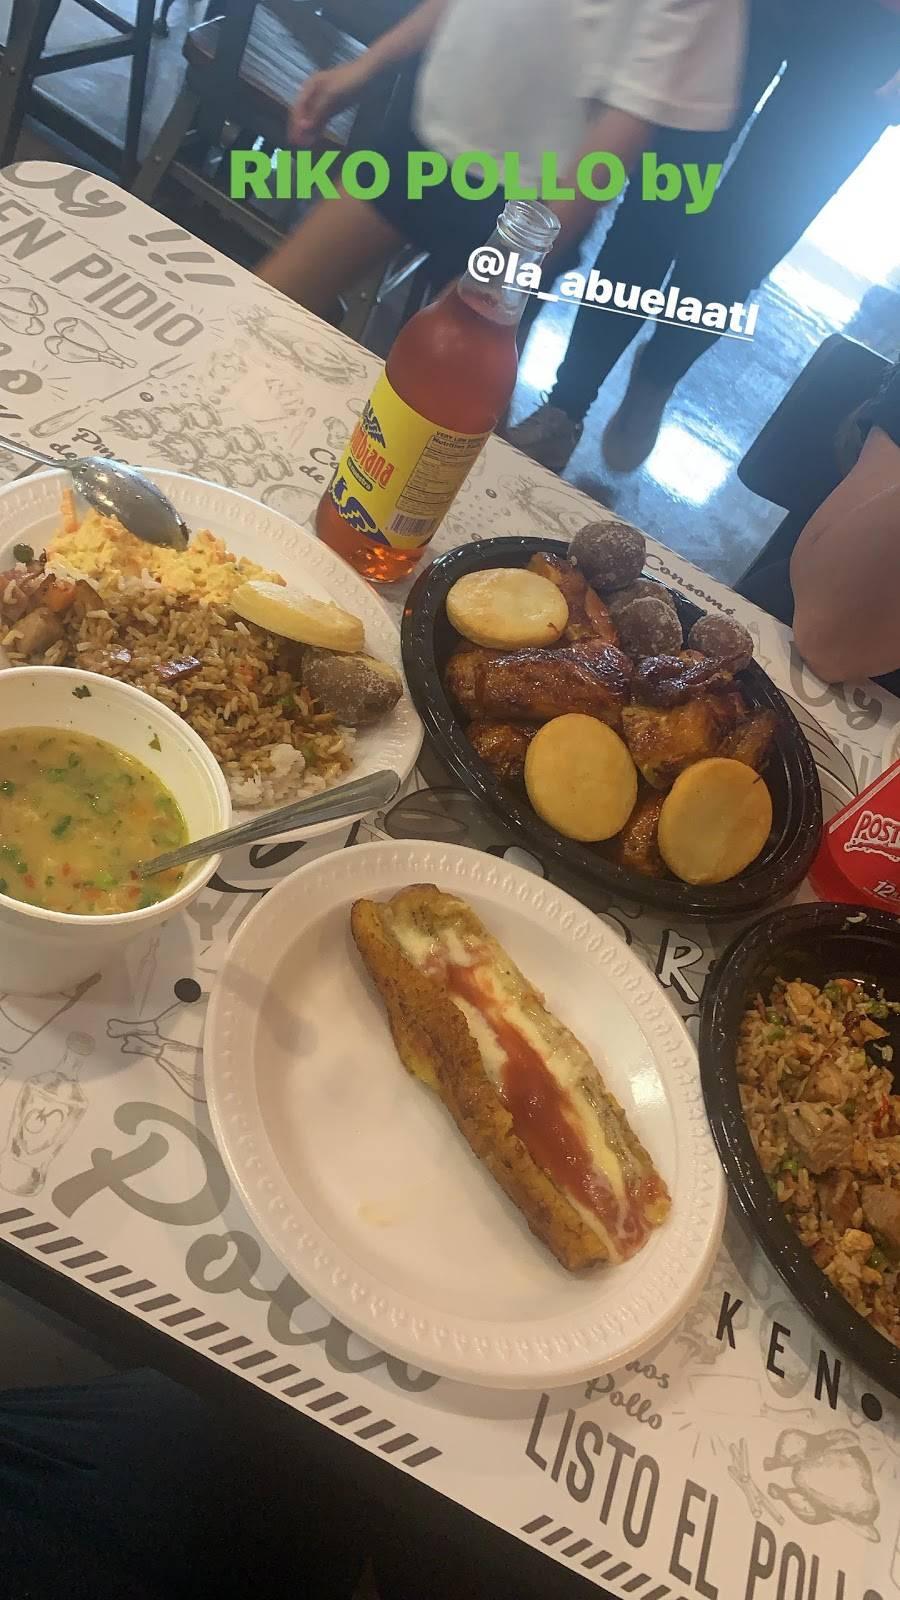 RIKO POLLO By La Abuela | restaurant | 1630 Pleasant Hill Rd Suite 240, Duluth, GA 30096, USA | 6786915593 OR +1 678-691-5593